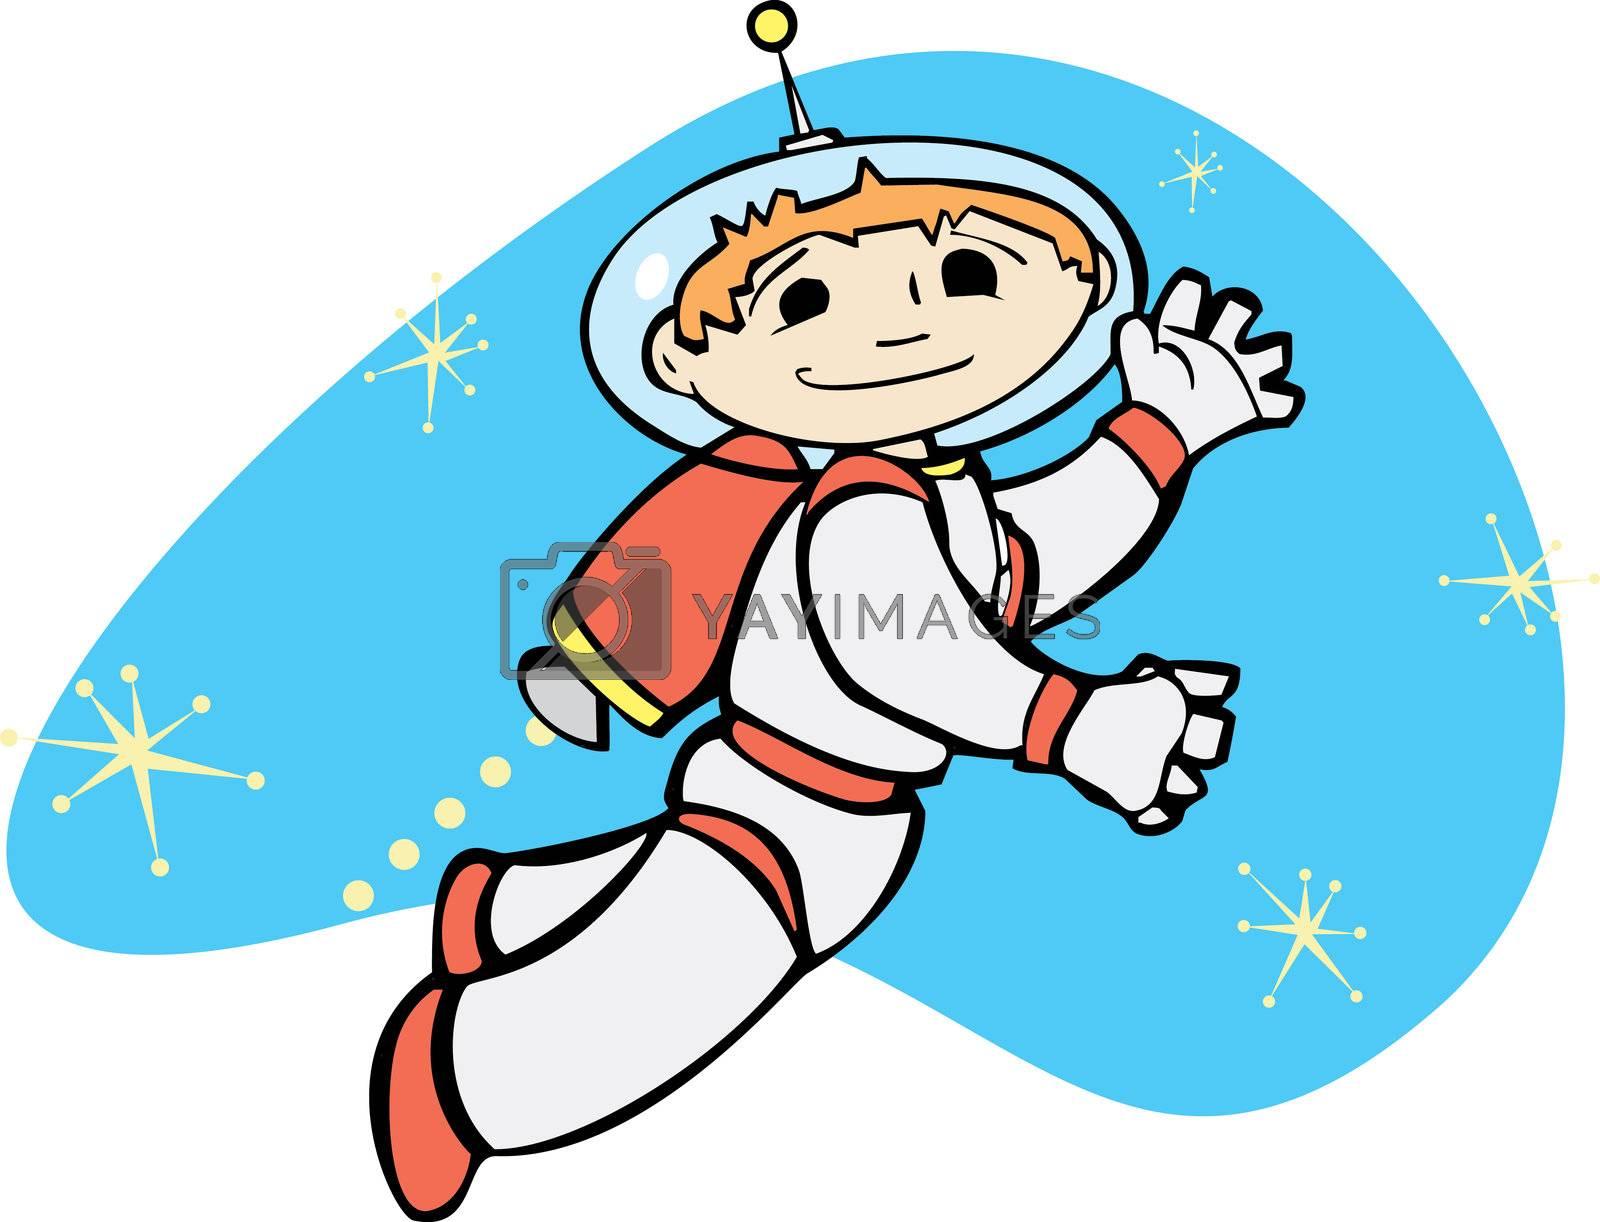 Retro boy in a jet pack flies through space.